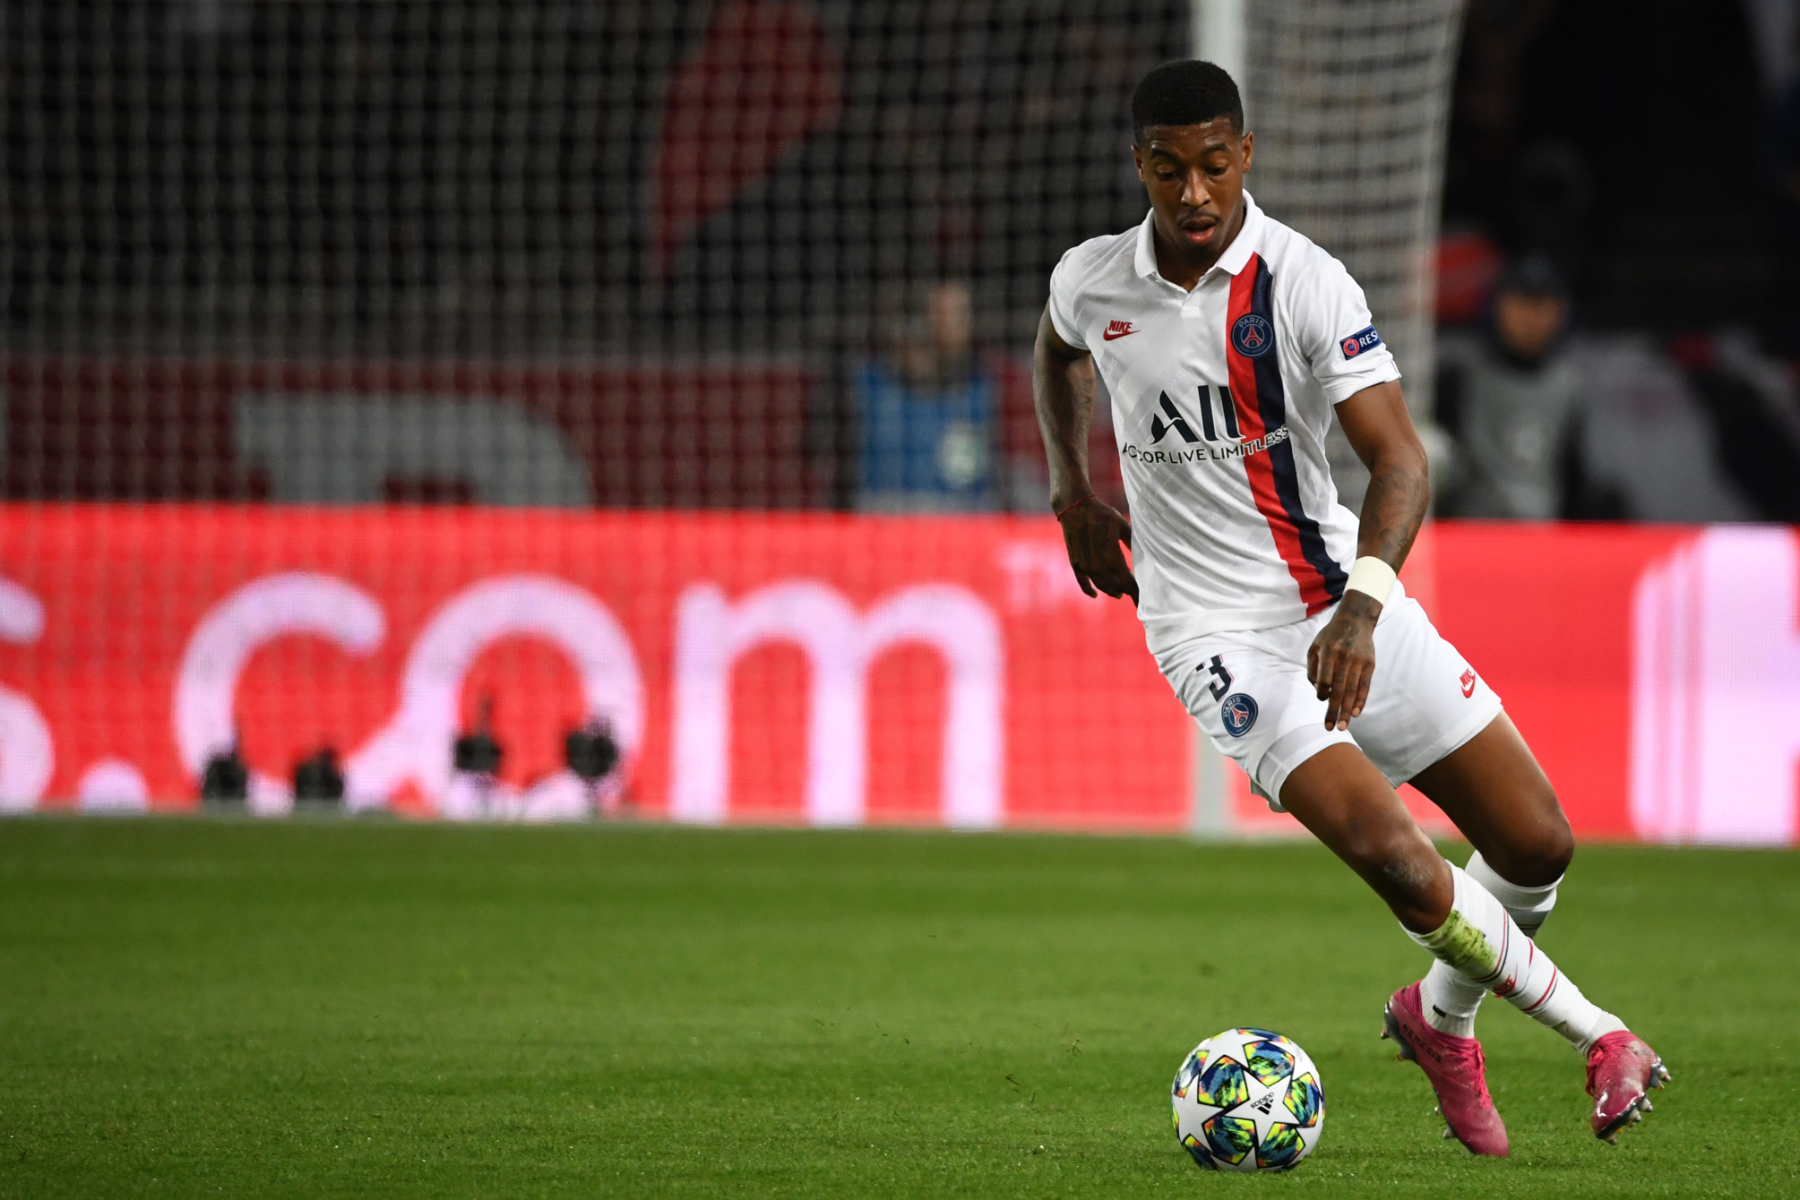 Kimpembe Slams Marseille: 'I'll Never Go There' - PSG Talk